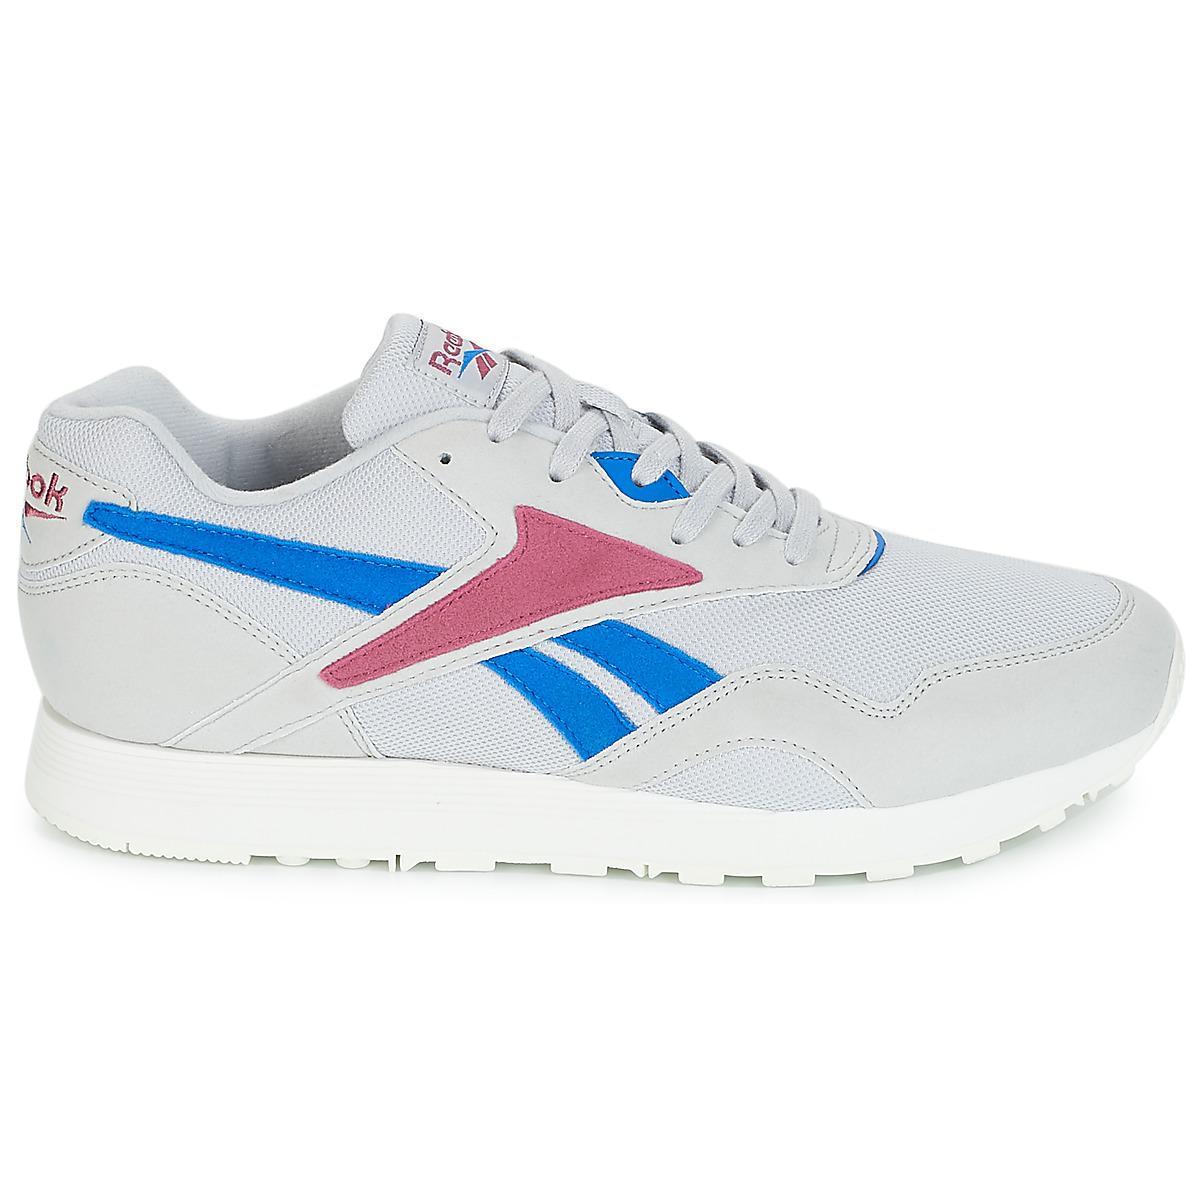 06629f239e8 Reebok - Gray Rapide Mu Shoes (trainers) for Men - Lyst. View fullscreen